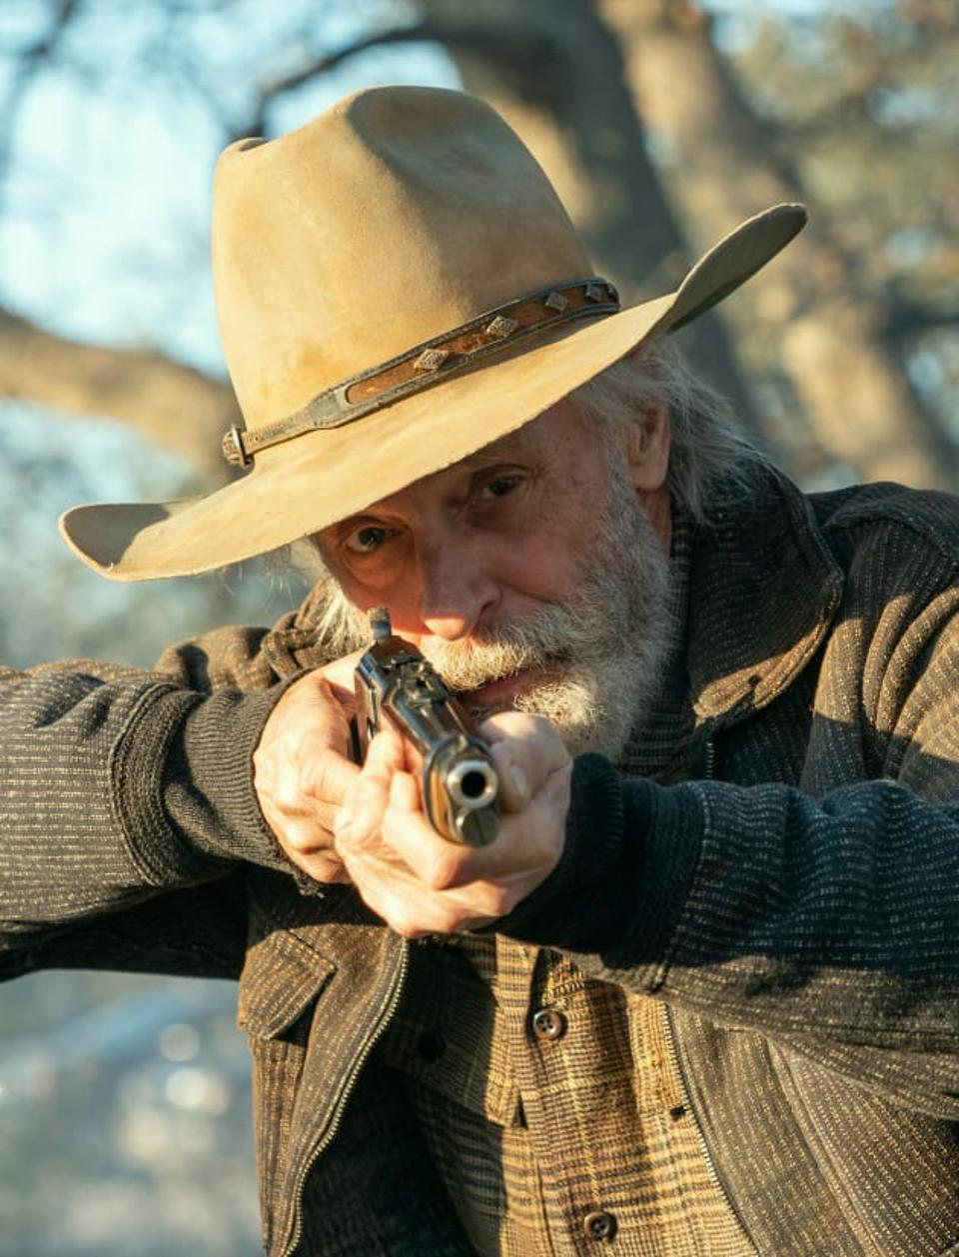 John Dorie's father with a gun in Fear The Walking Dead